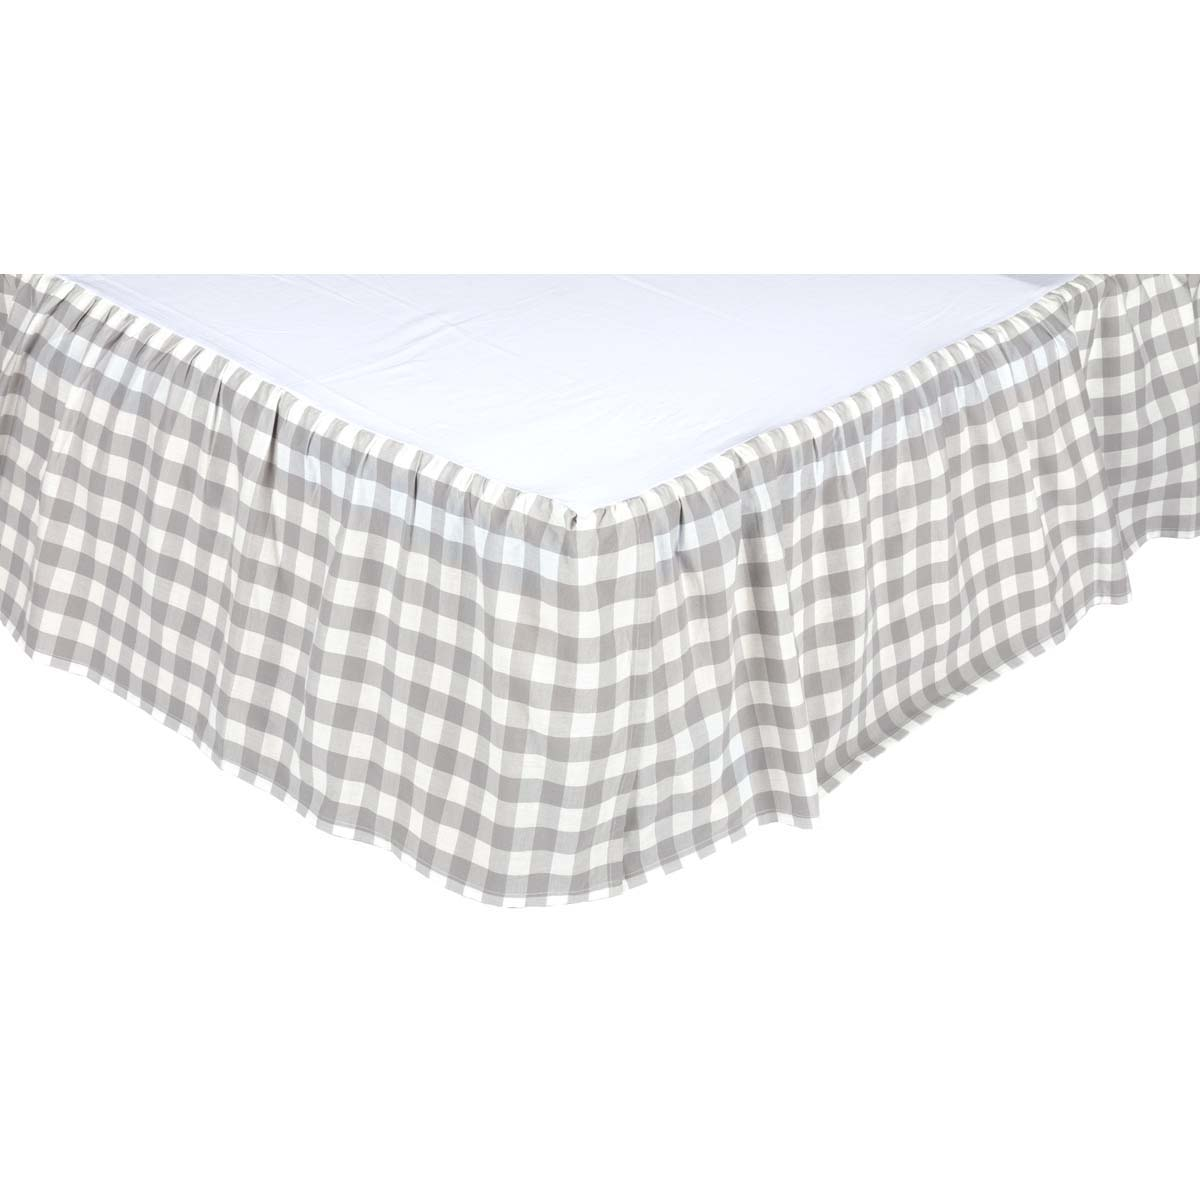 Annie Buffalo Grey Check Queen Bed Skirt 60x80x16